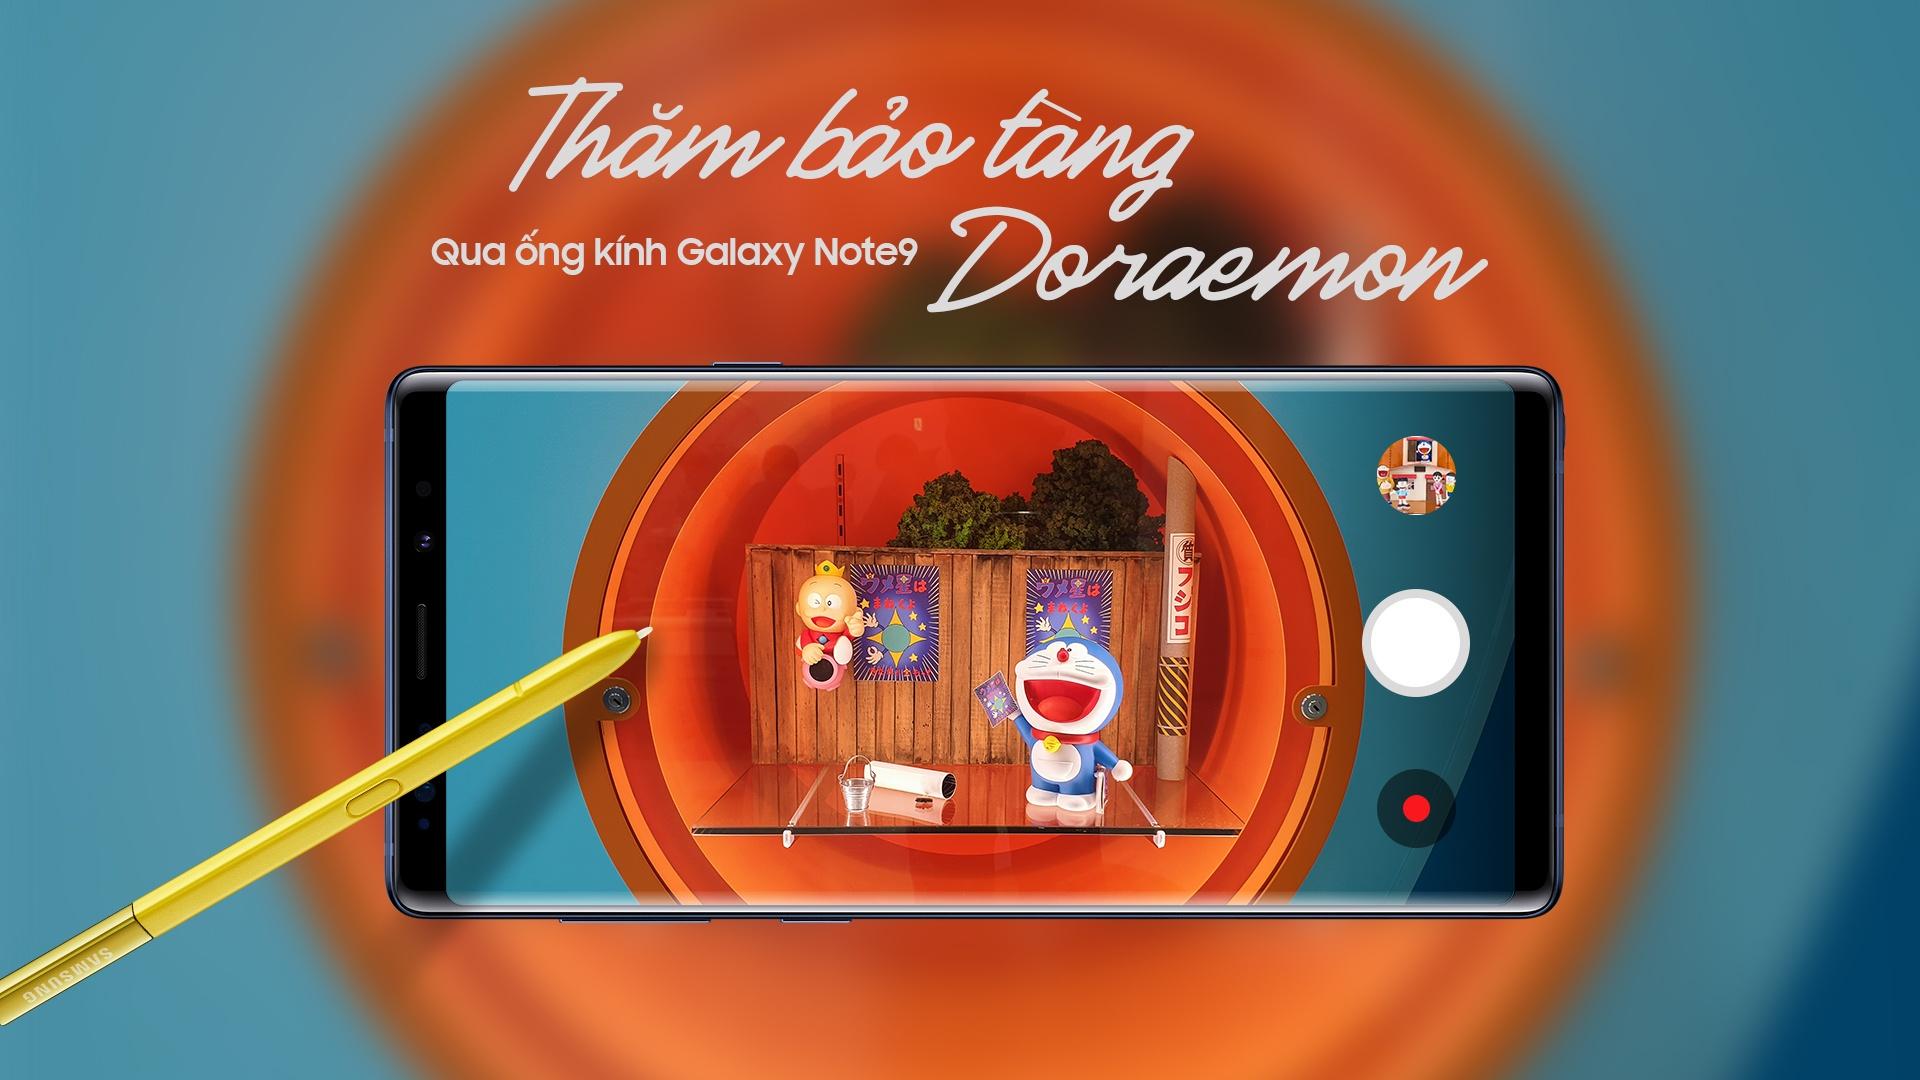 Tham bao tang Doraemon qua ong kinh Galaxy Note9 hinh anh 2